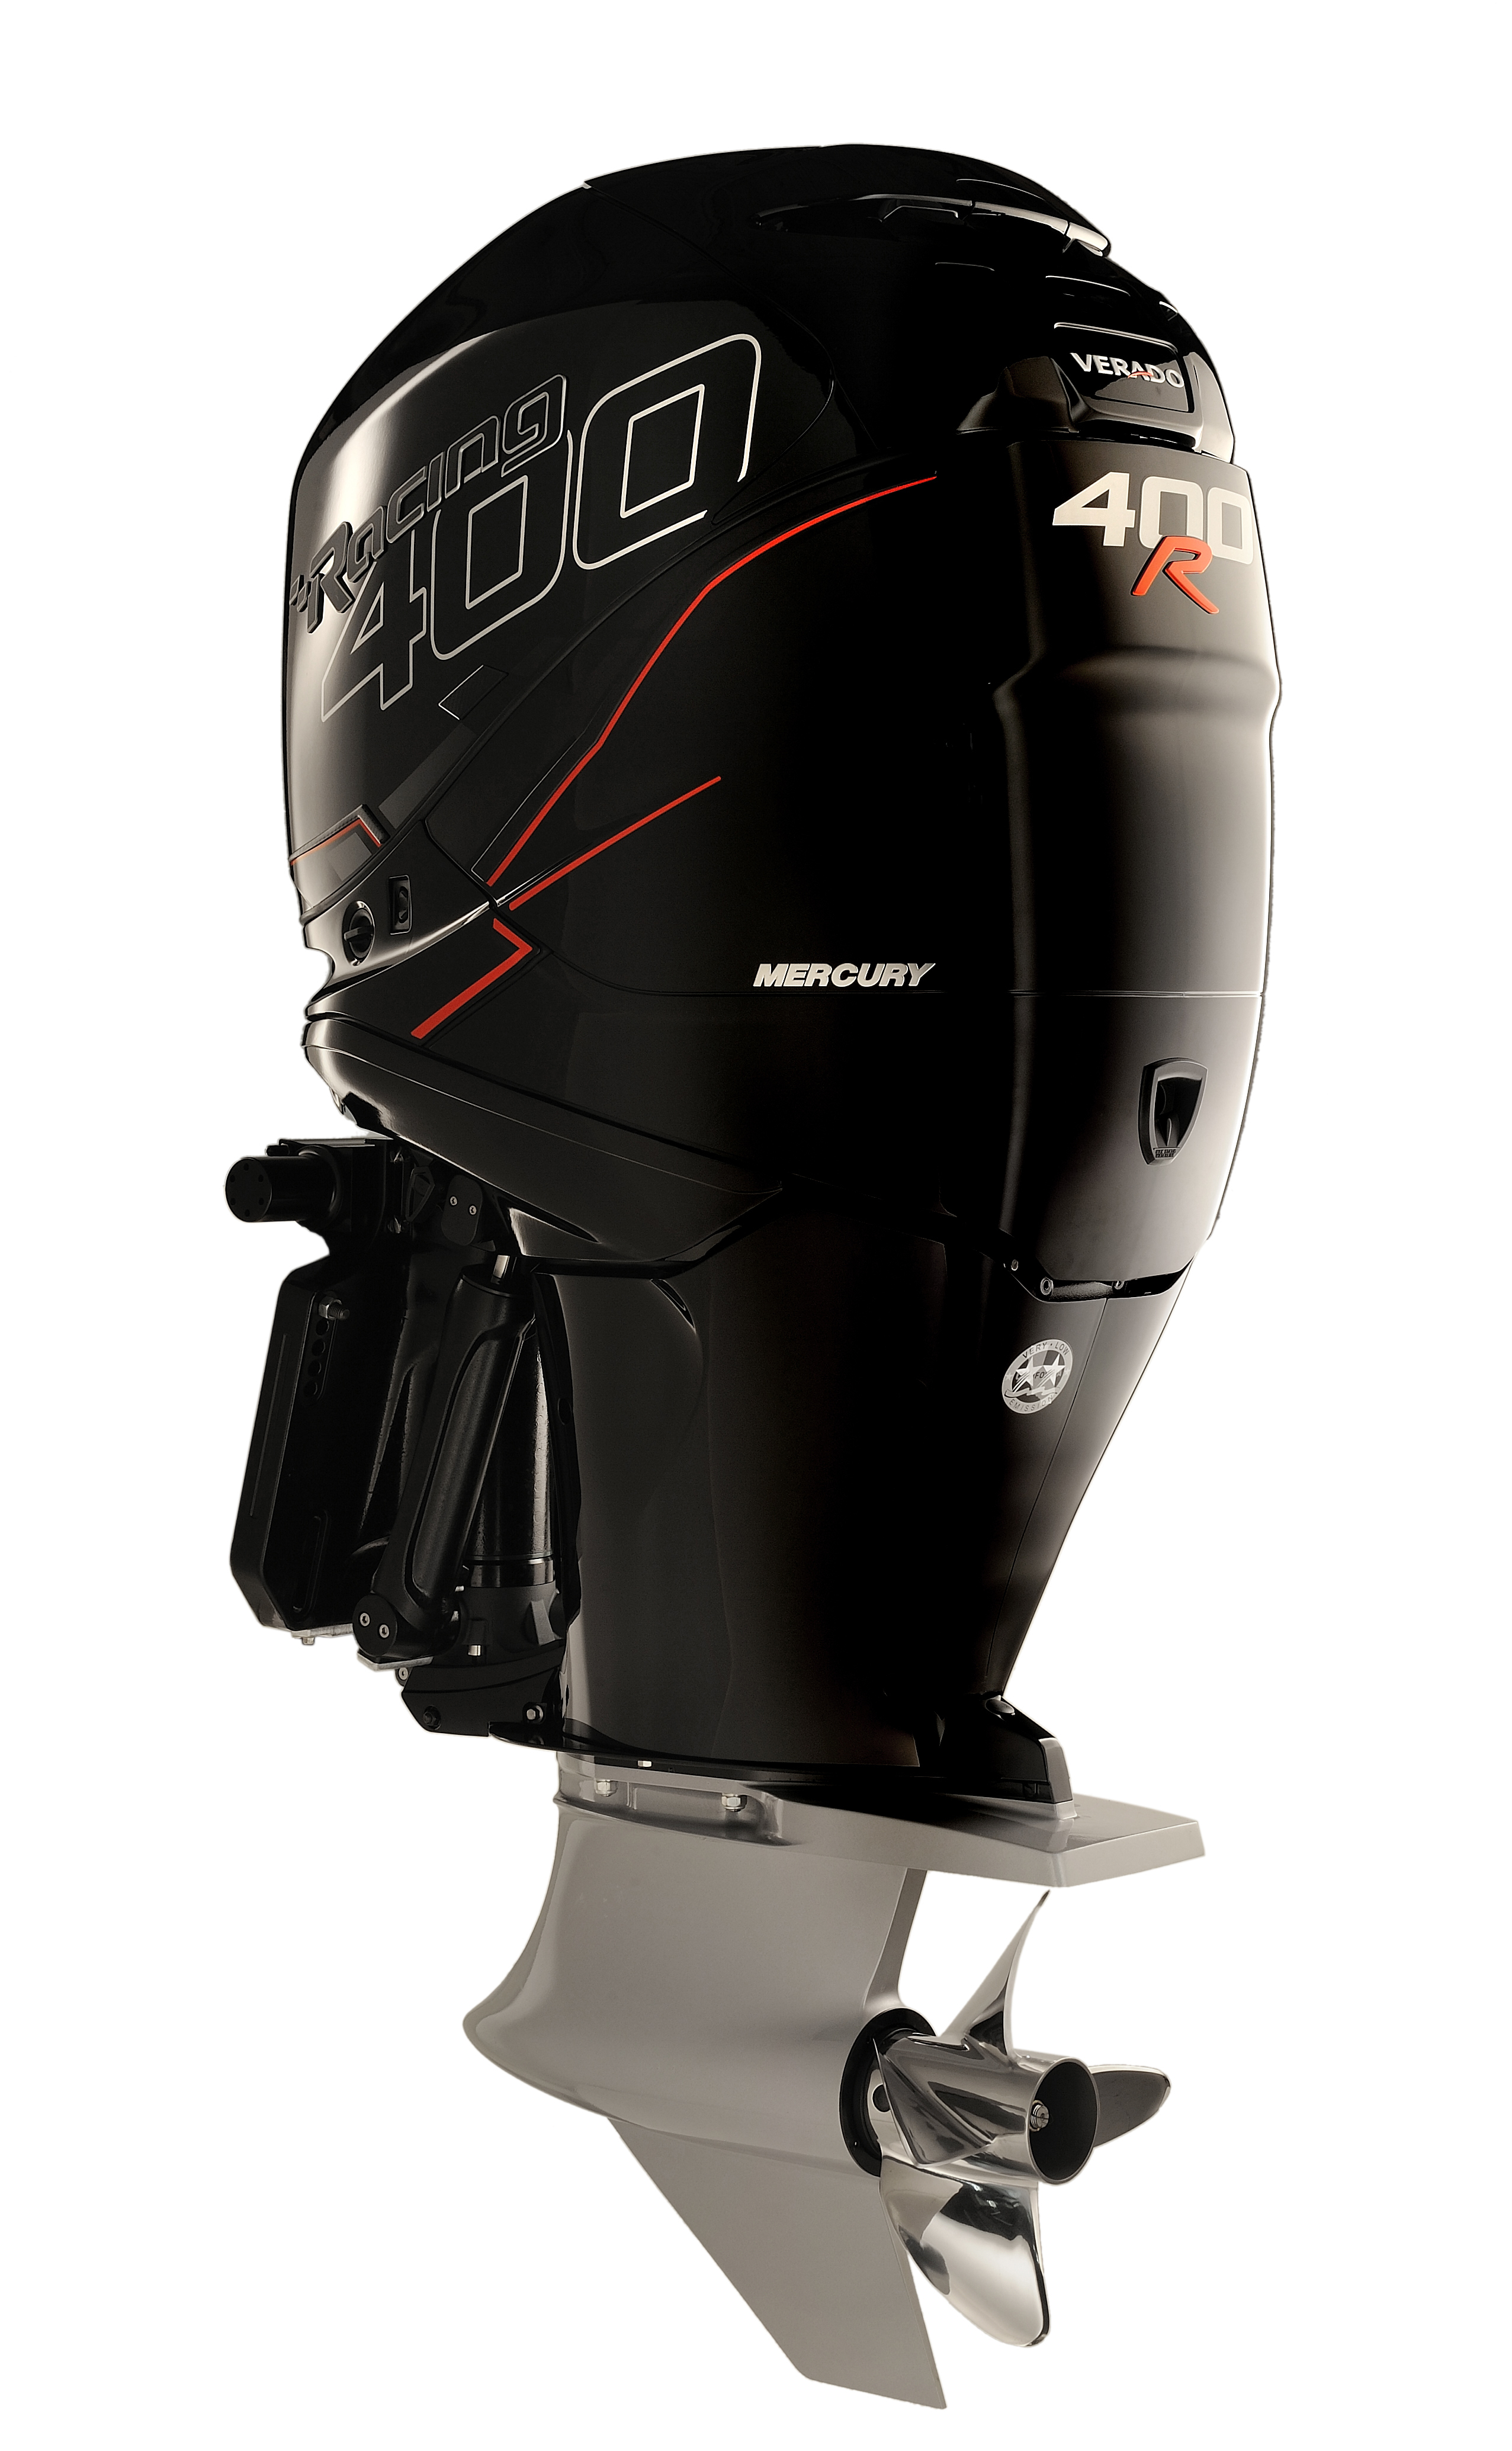 verado 400r xxl heavy duty gc 2598 cc 312kg four stroke